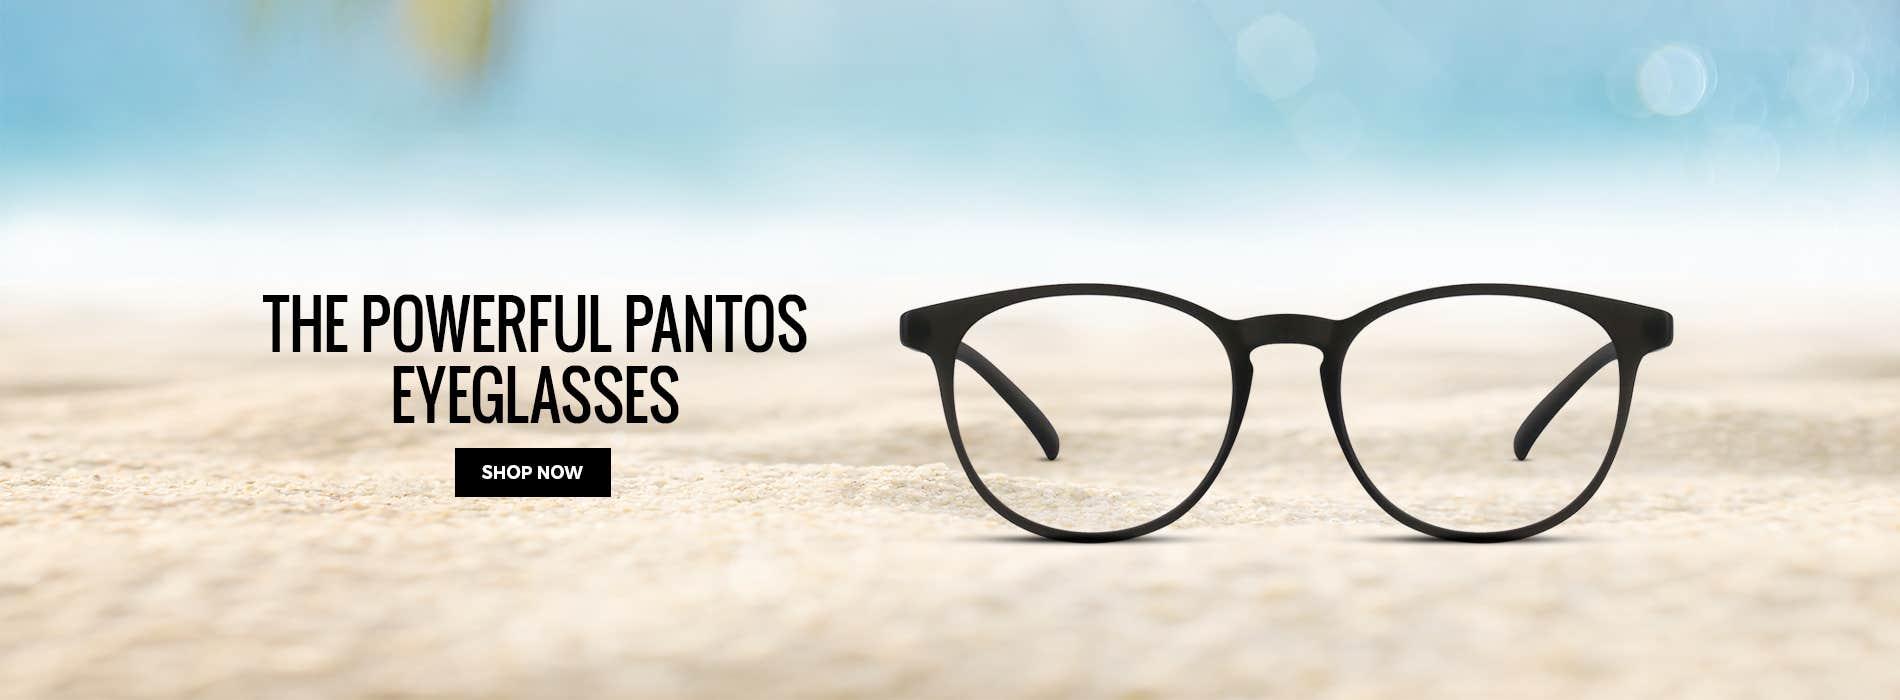 The Powerful Pantos Eyeglasses